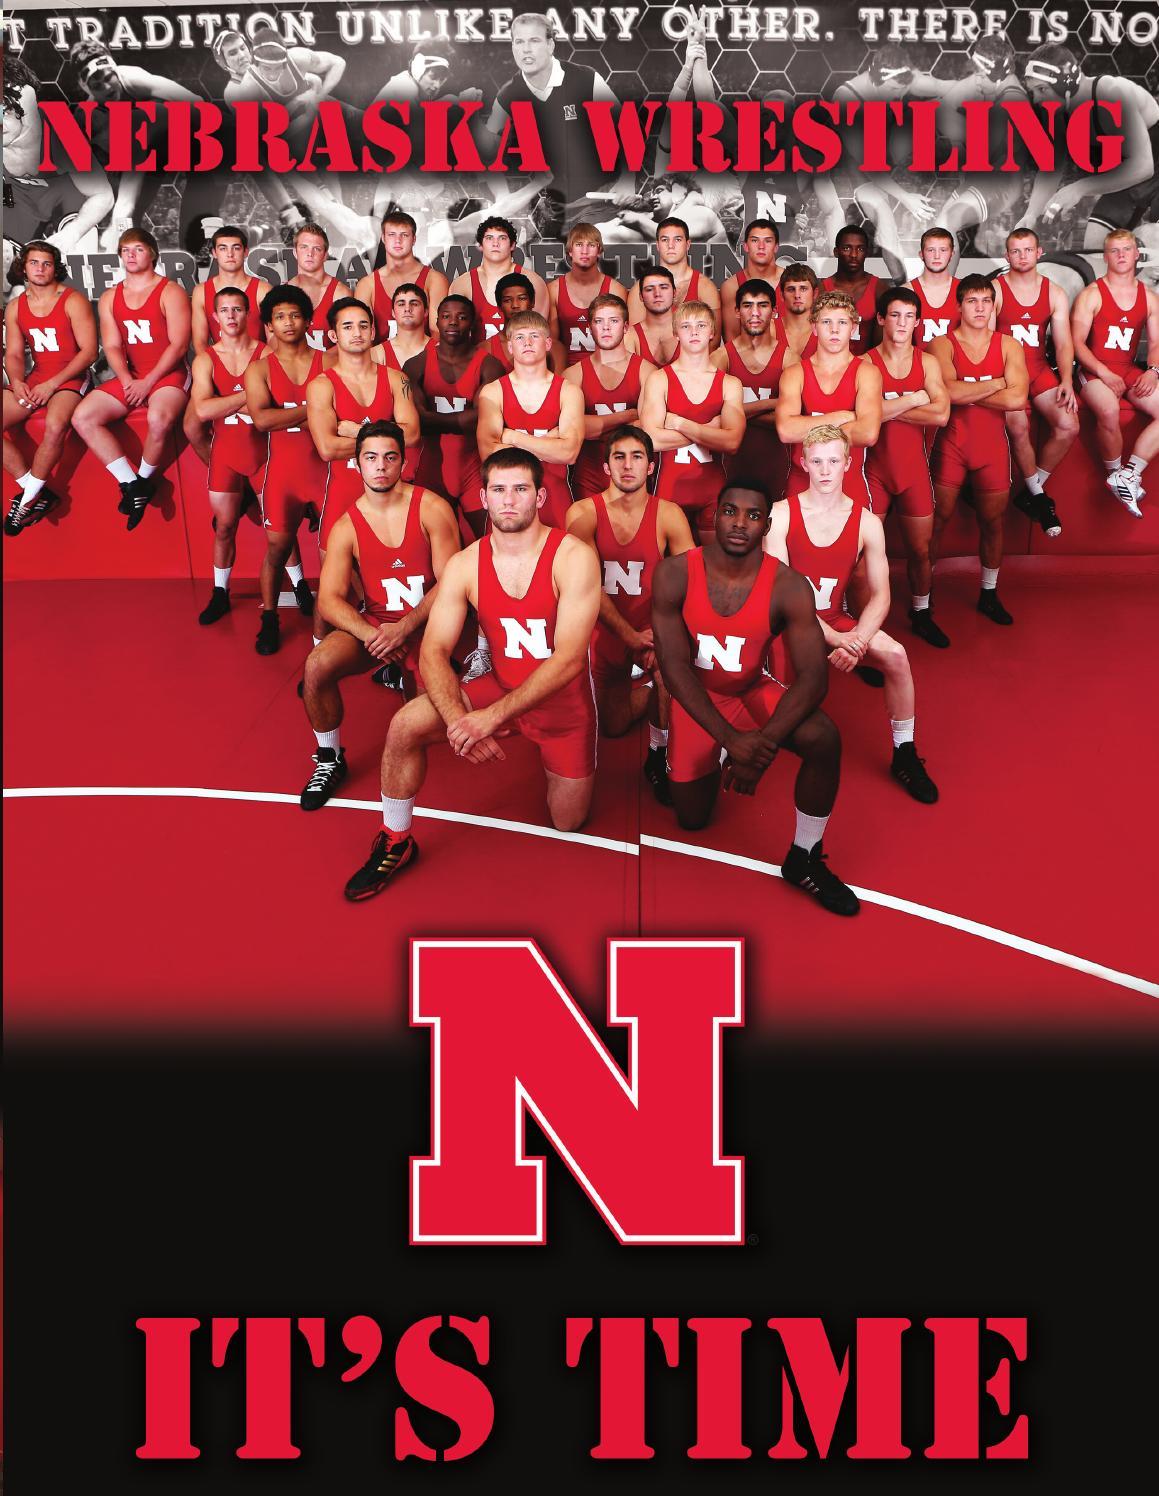 2013 14 Nebraska Wrestling Guide By Matt Smith Issuu